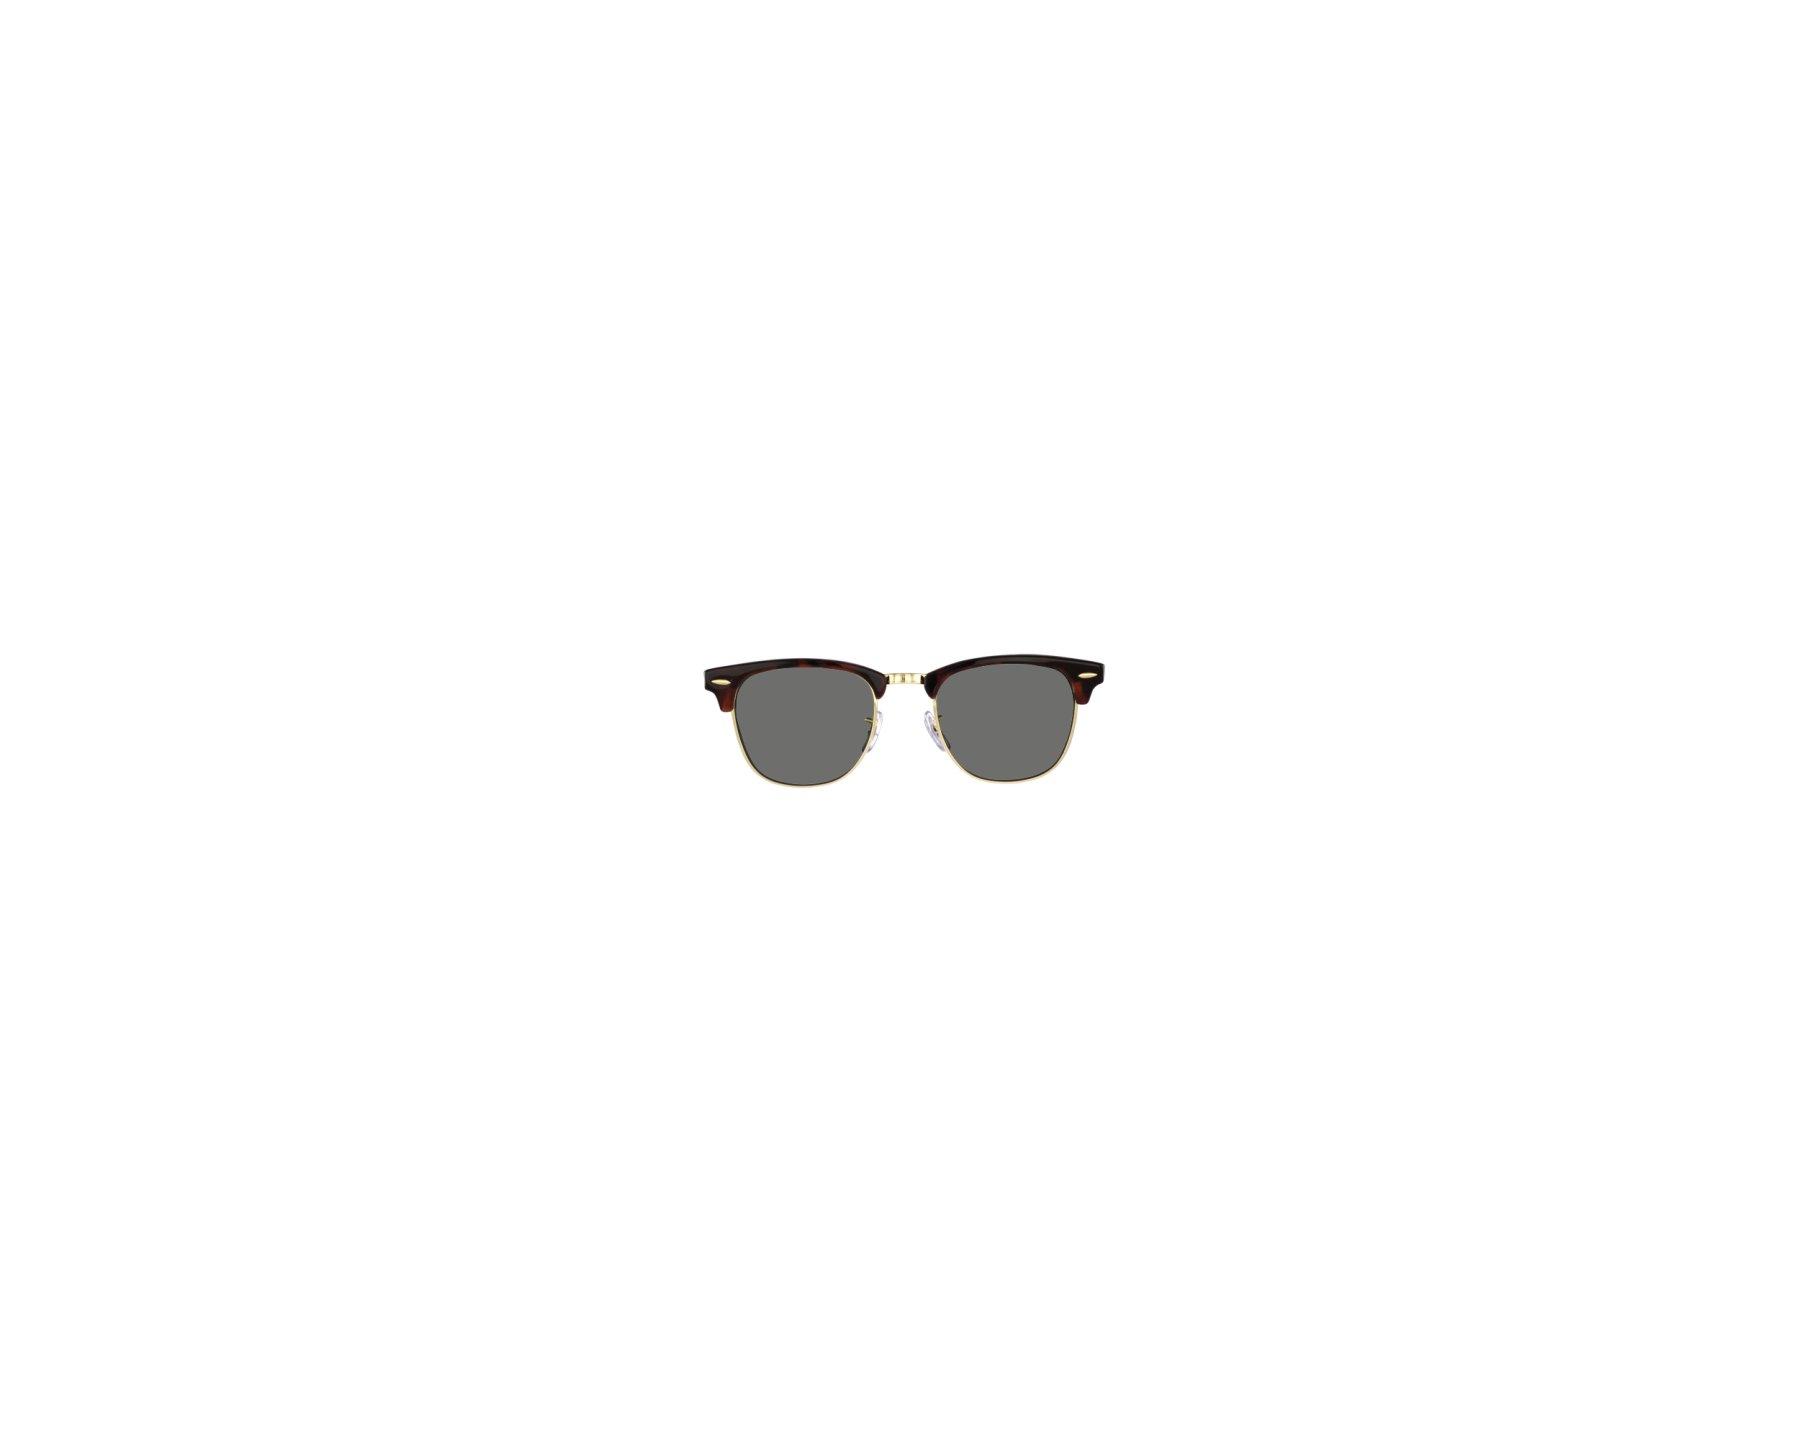 Gafas Ray Ban Clubmaster Rb3016